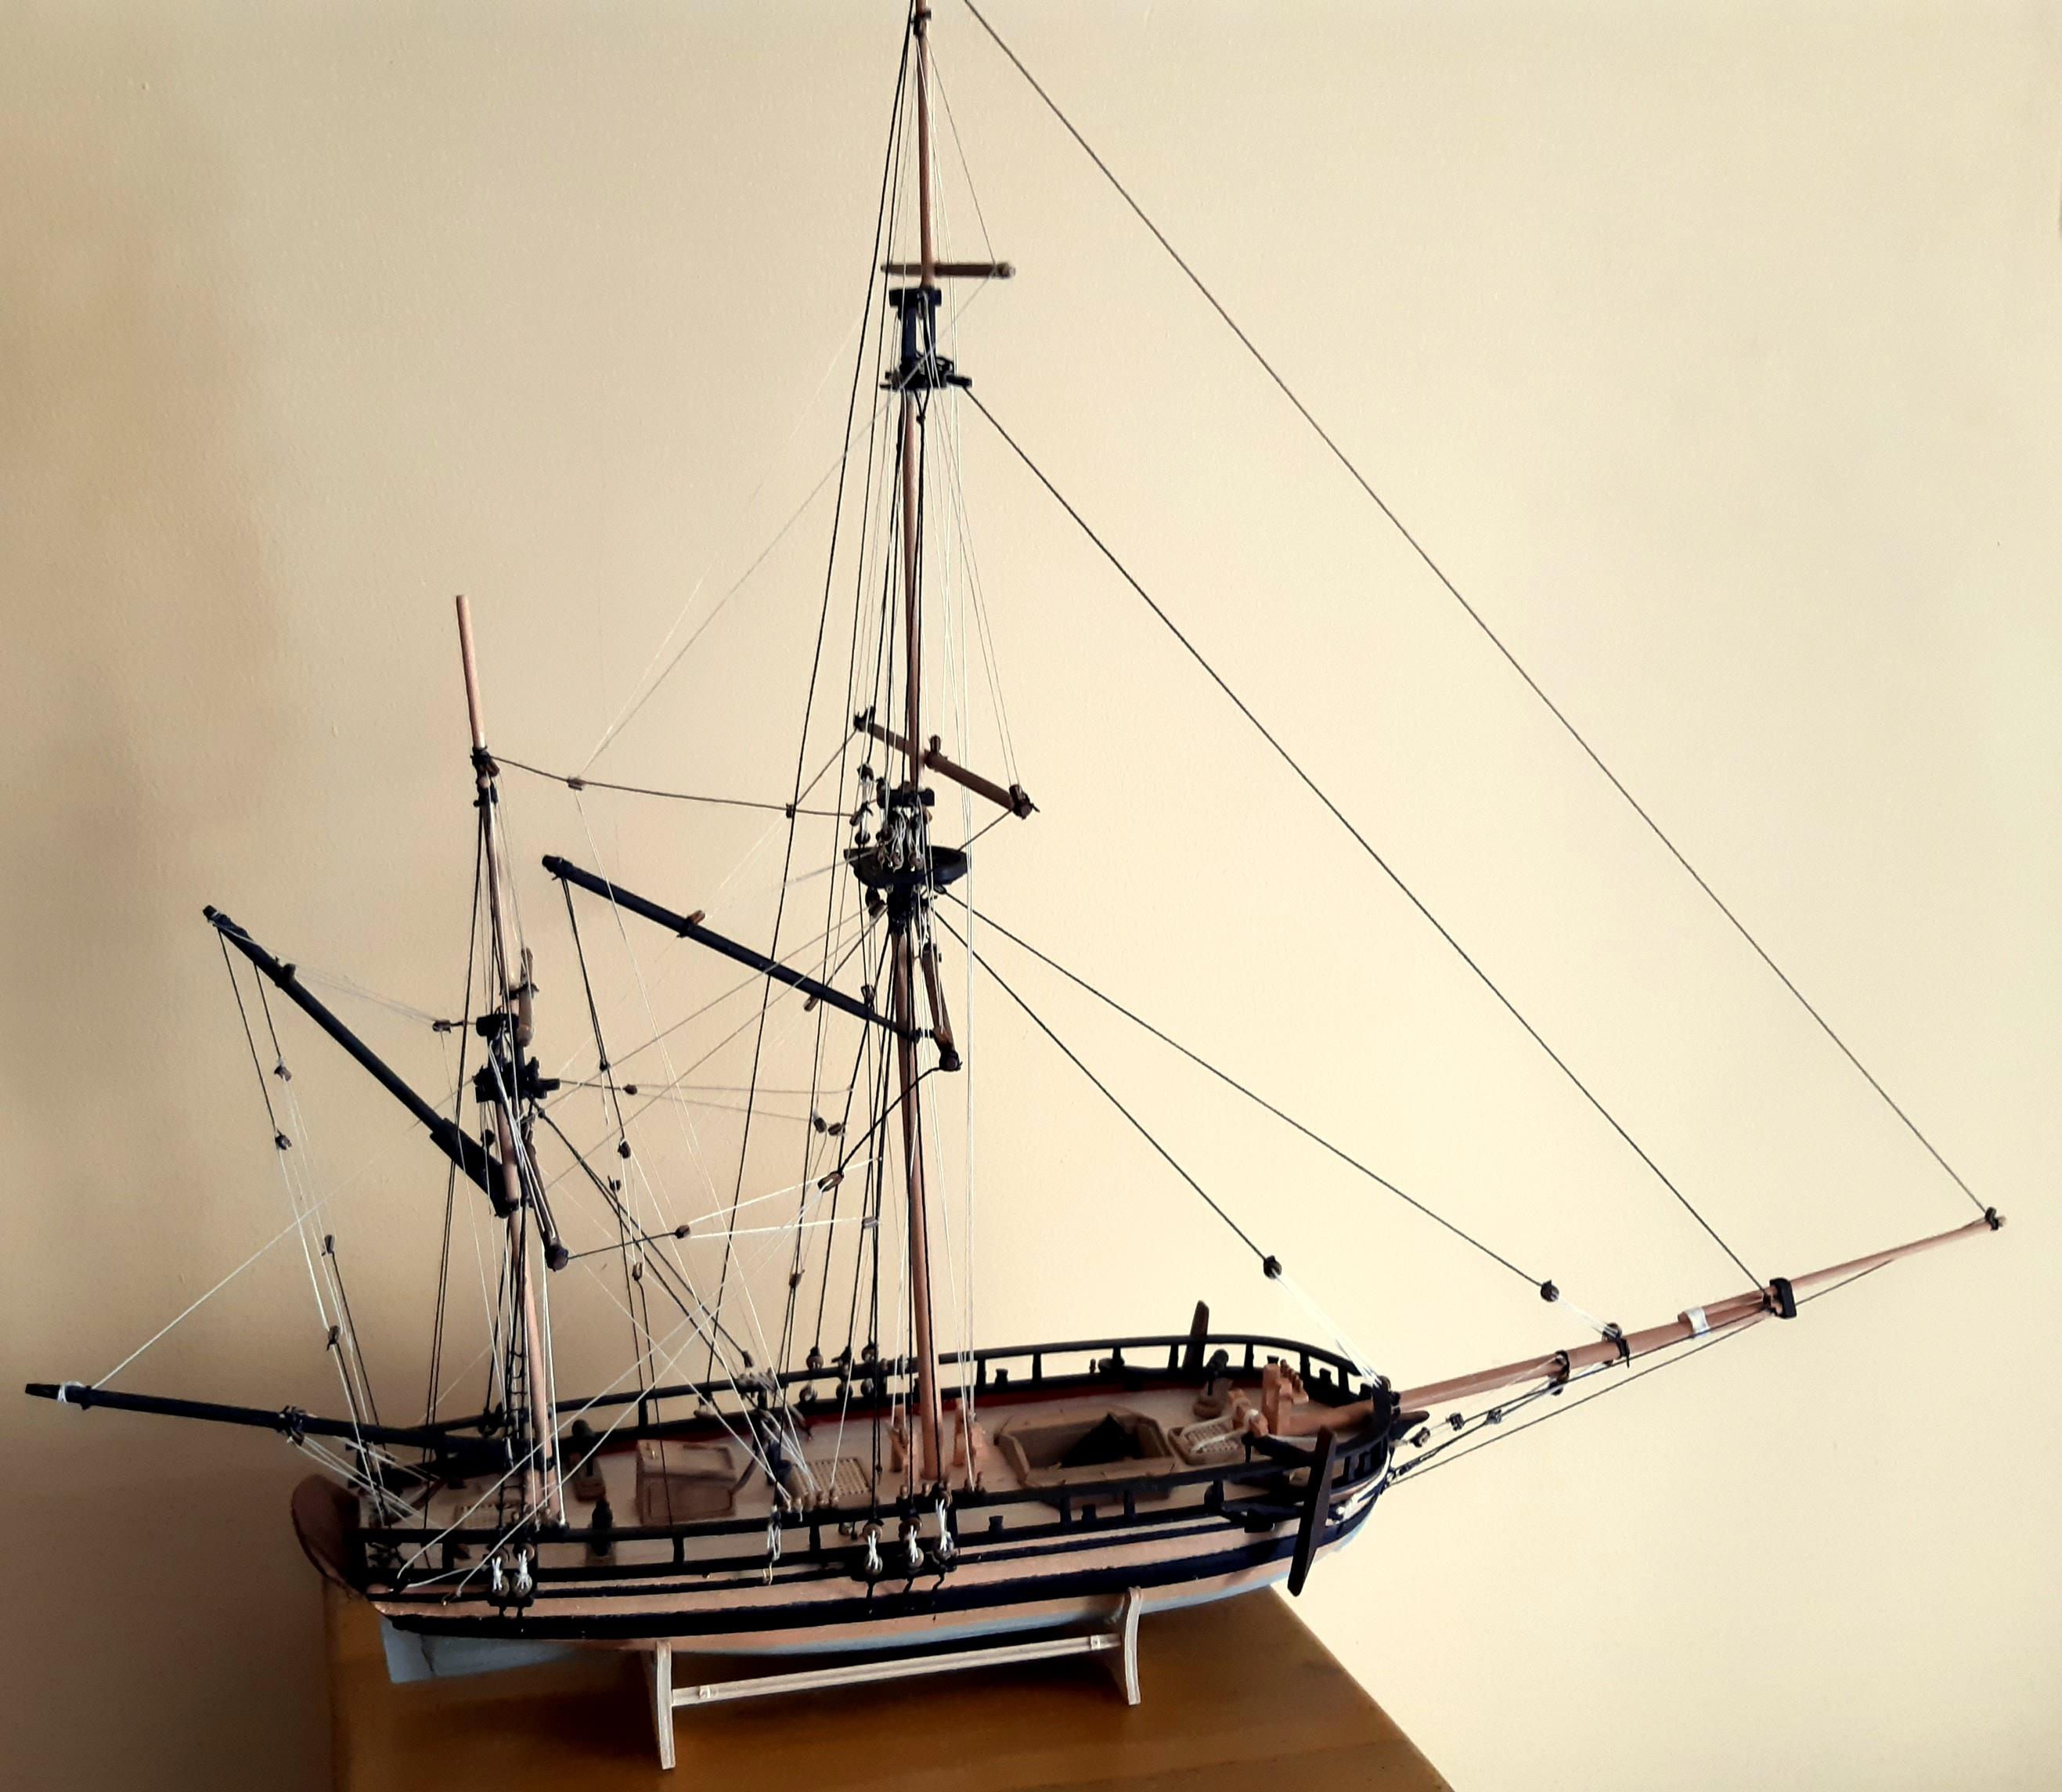 boat98 (2).jpg